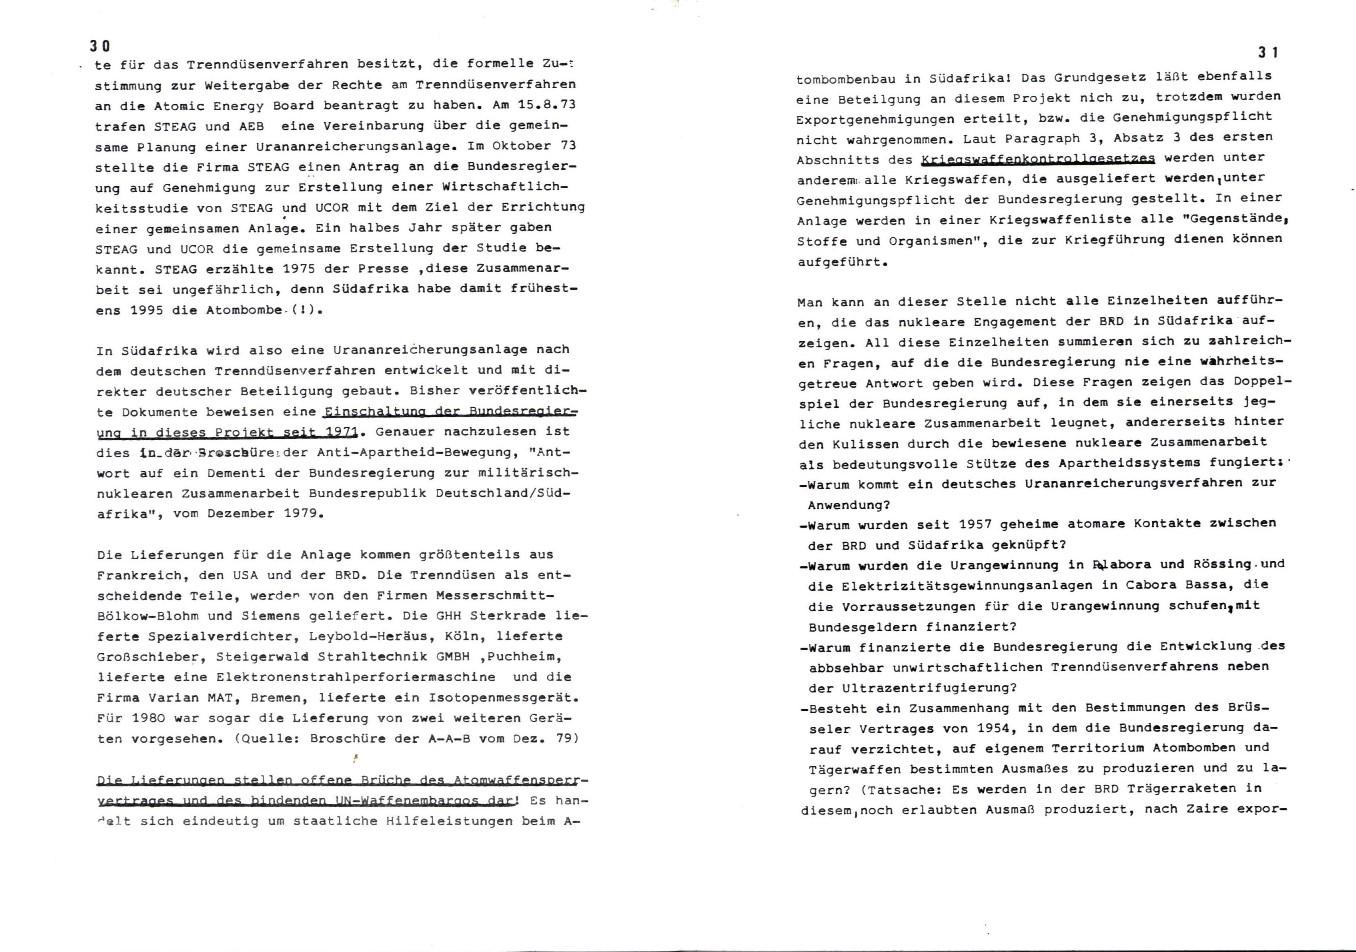 Muenster_AKAFRIK_1981_Suedafrika_BRD_17